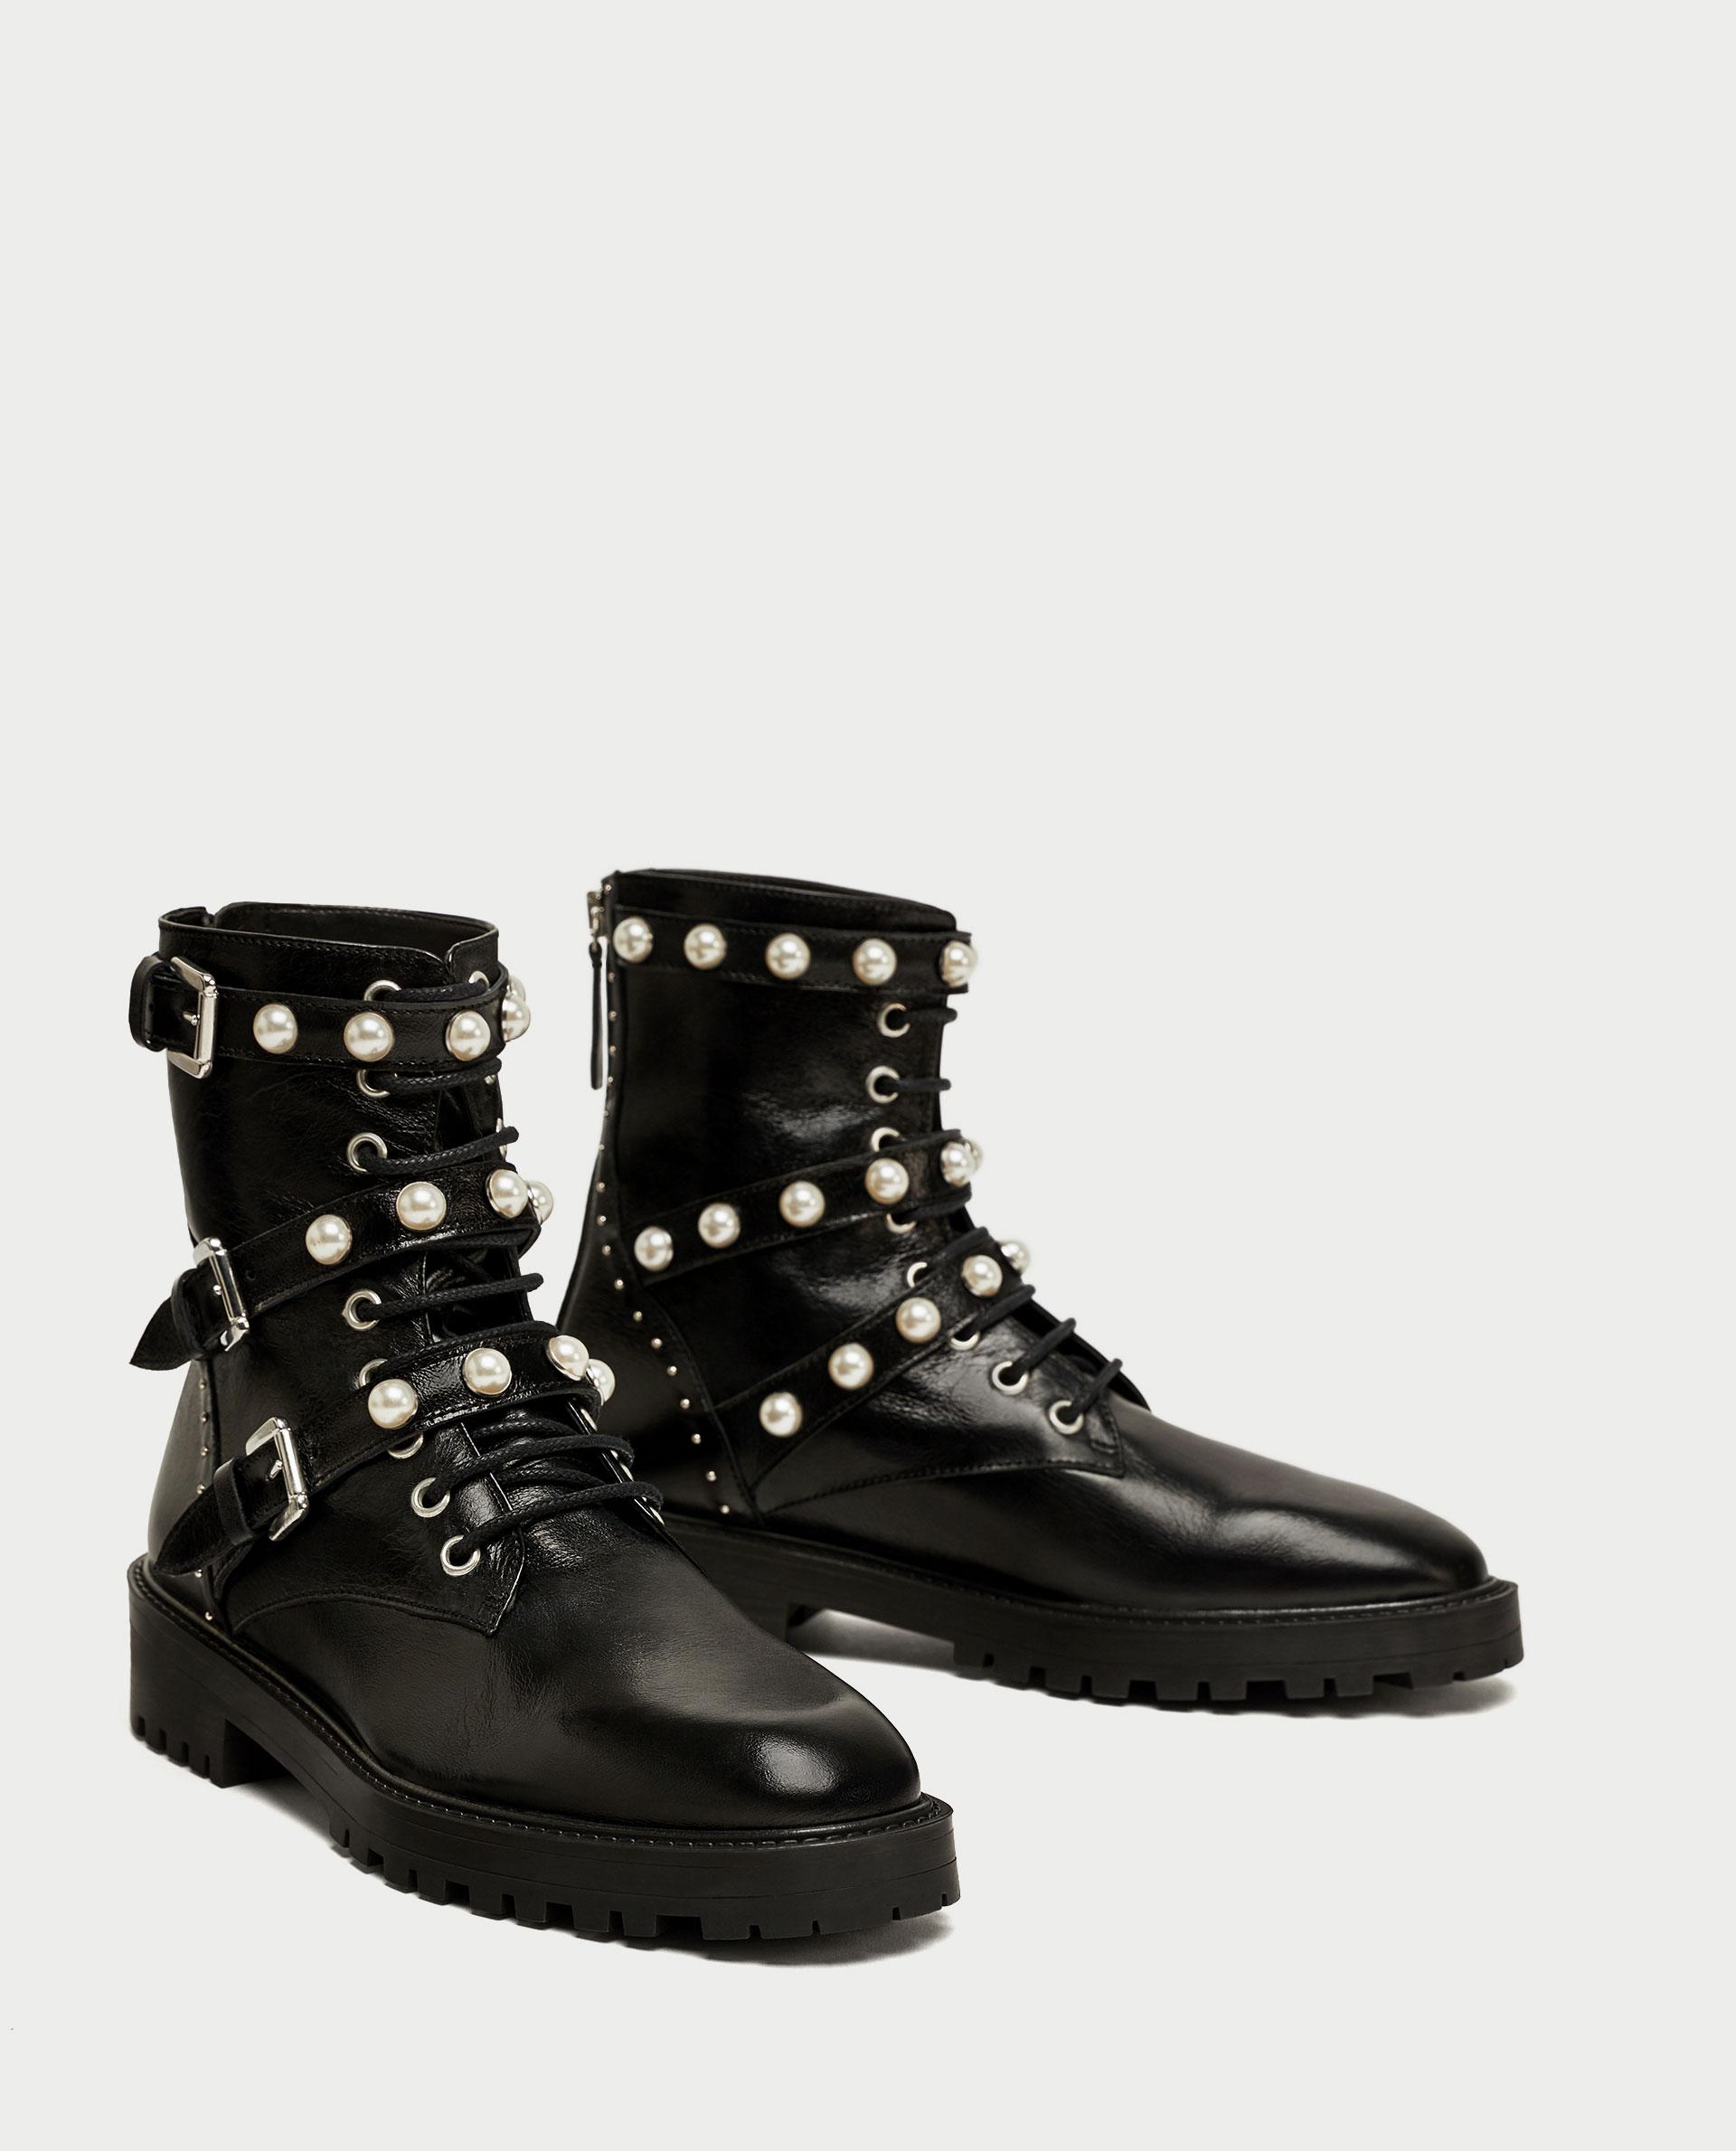 boots zara8